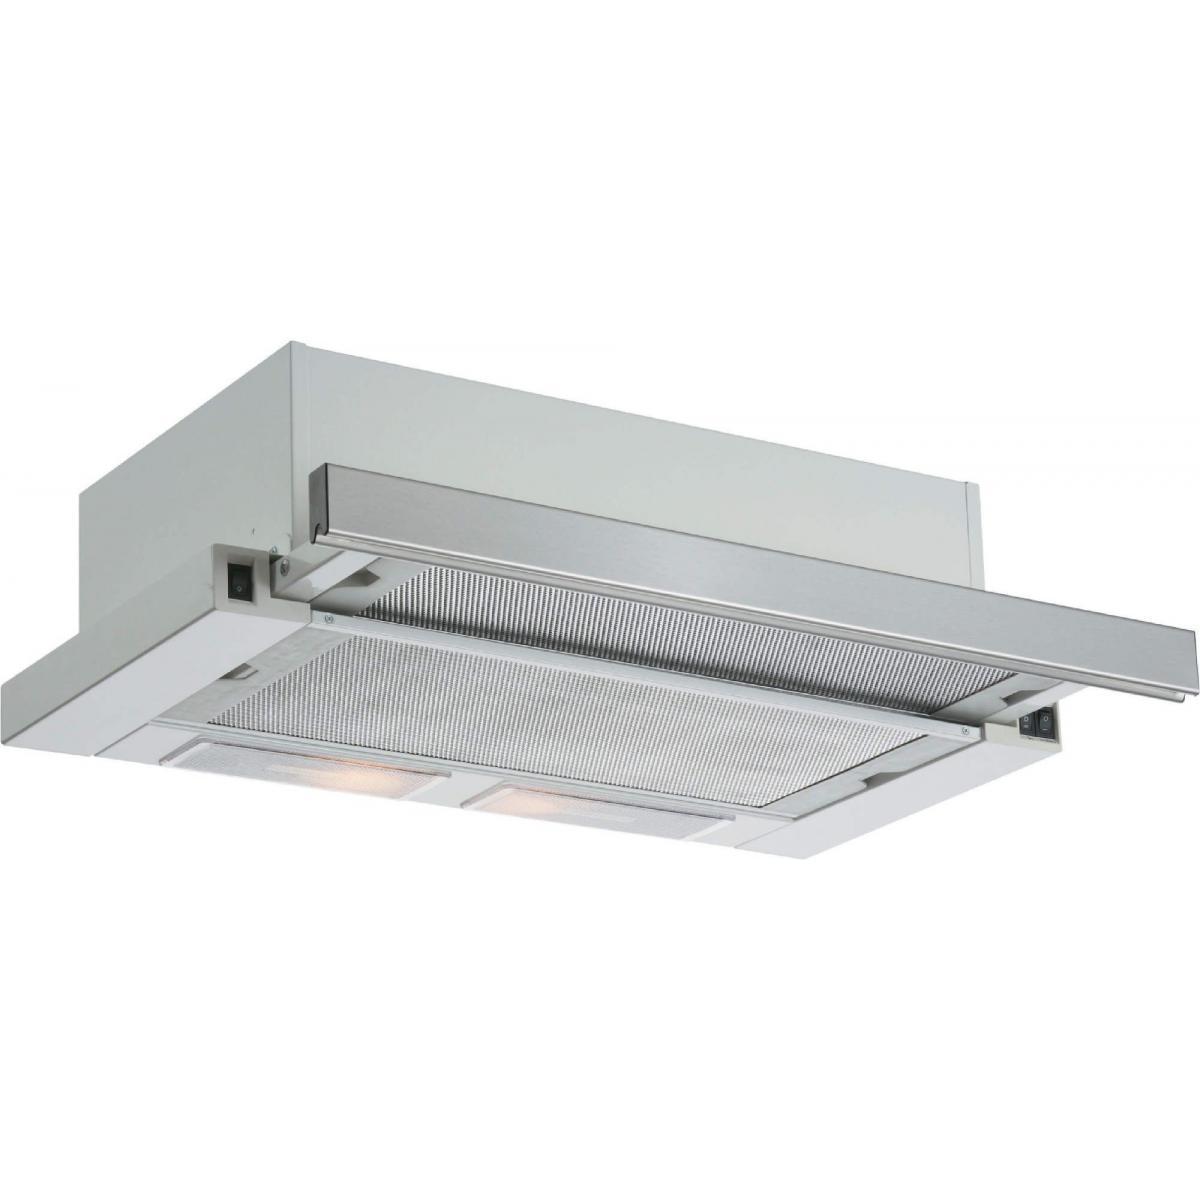 Silver Hotte tiroir 244m³/h SILVER 60cm E, H 50060 015